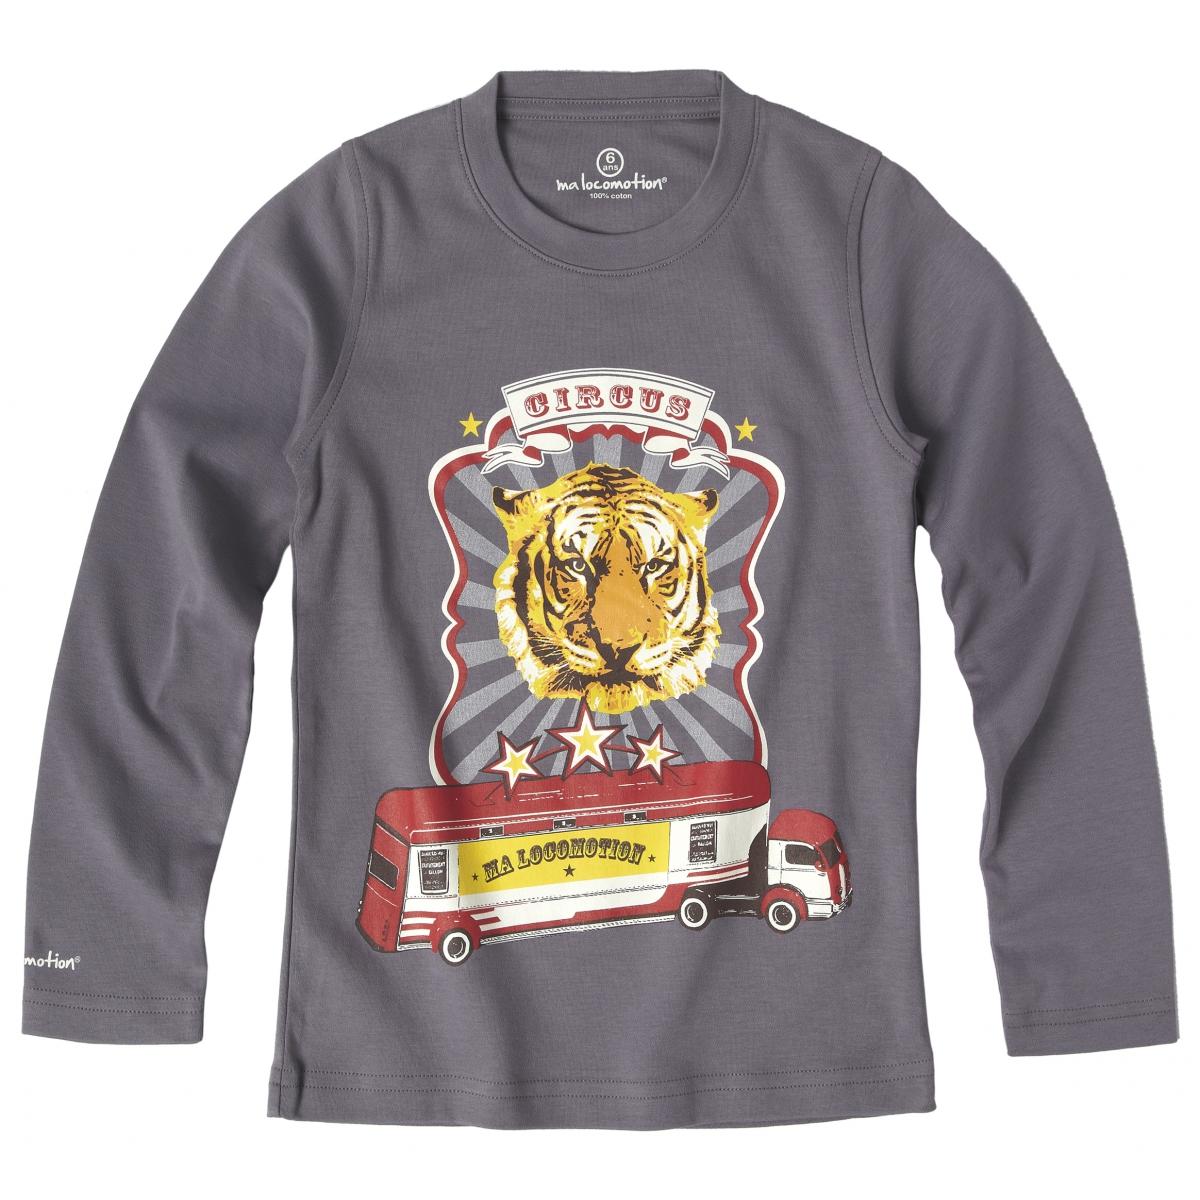 Circus T-shirt - anthracite